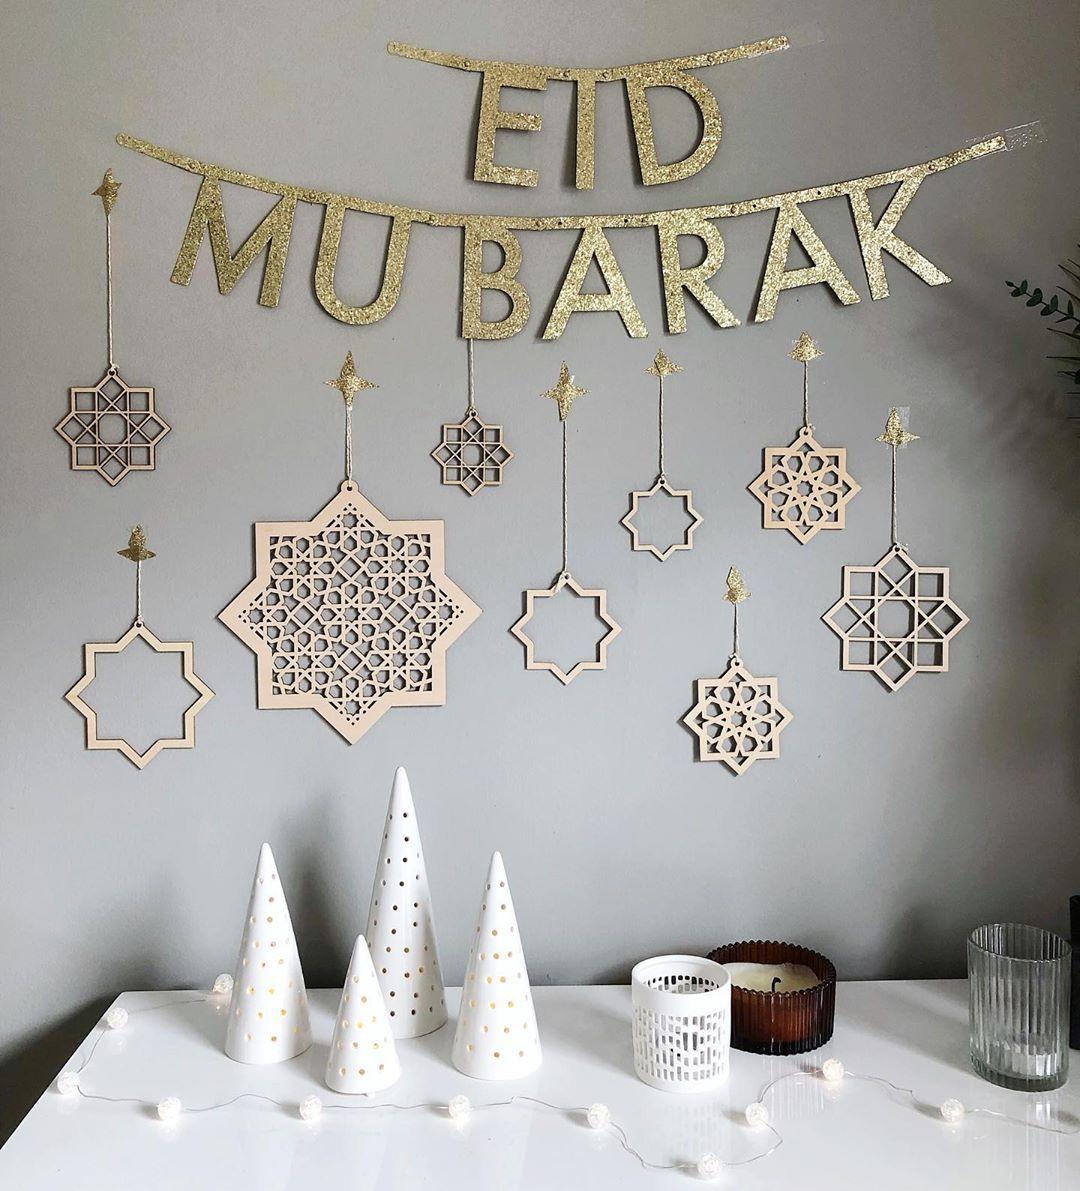 Eiddecoration Eidwoodendecor Diy Eid Decorations Eid Decoration Eid Mubarak Decoration